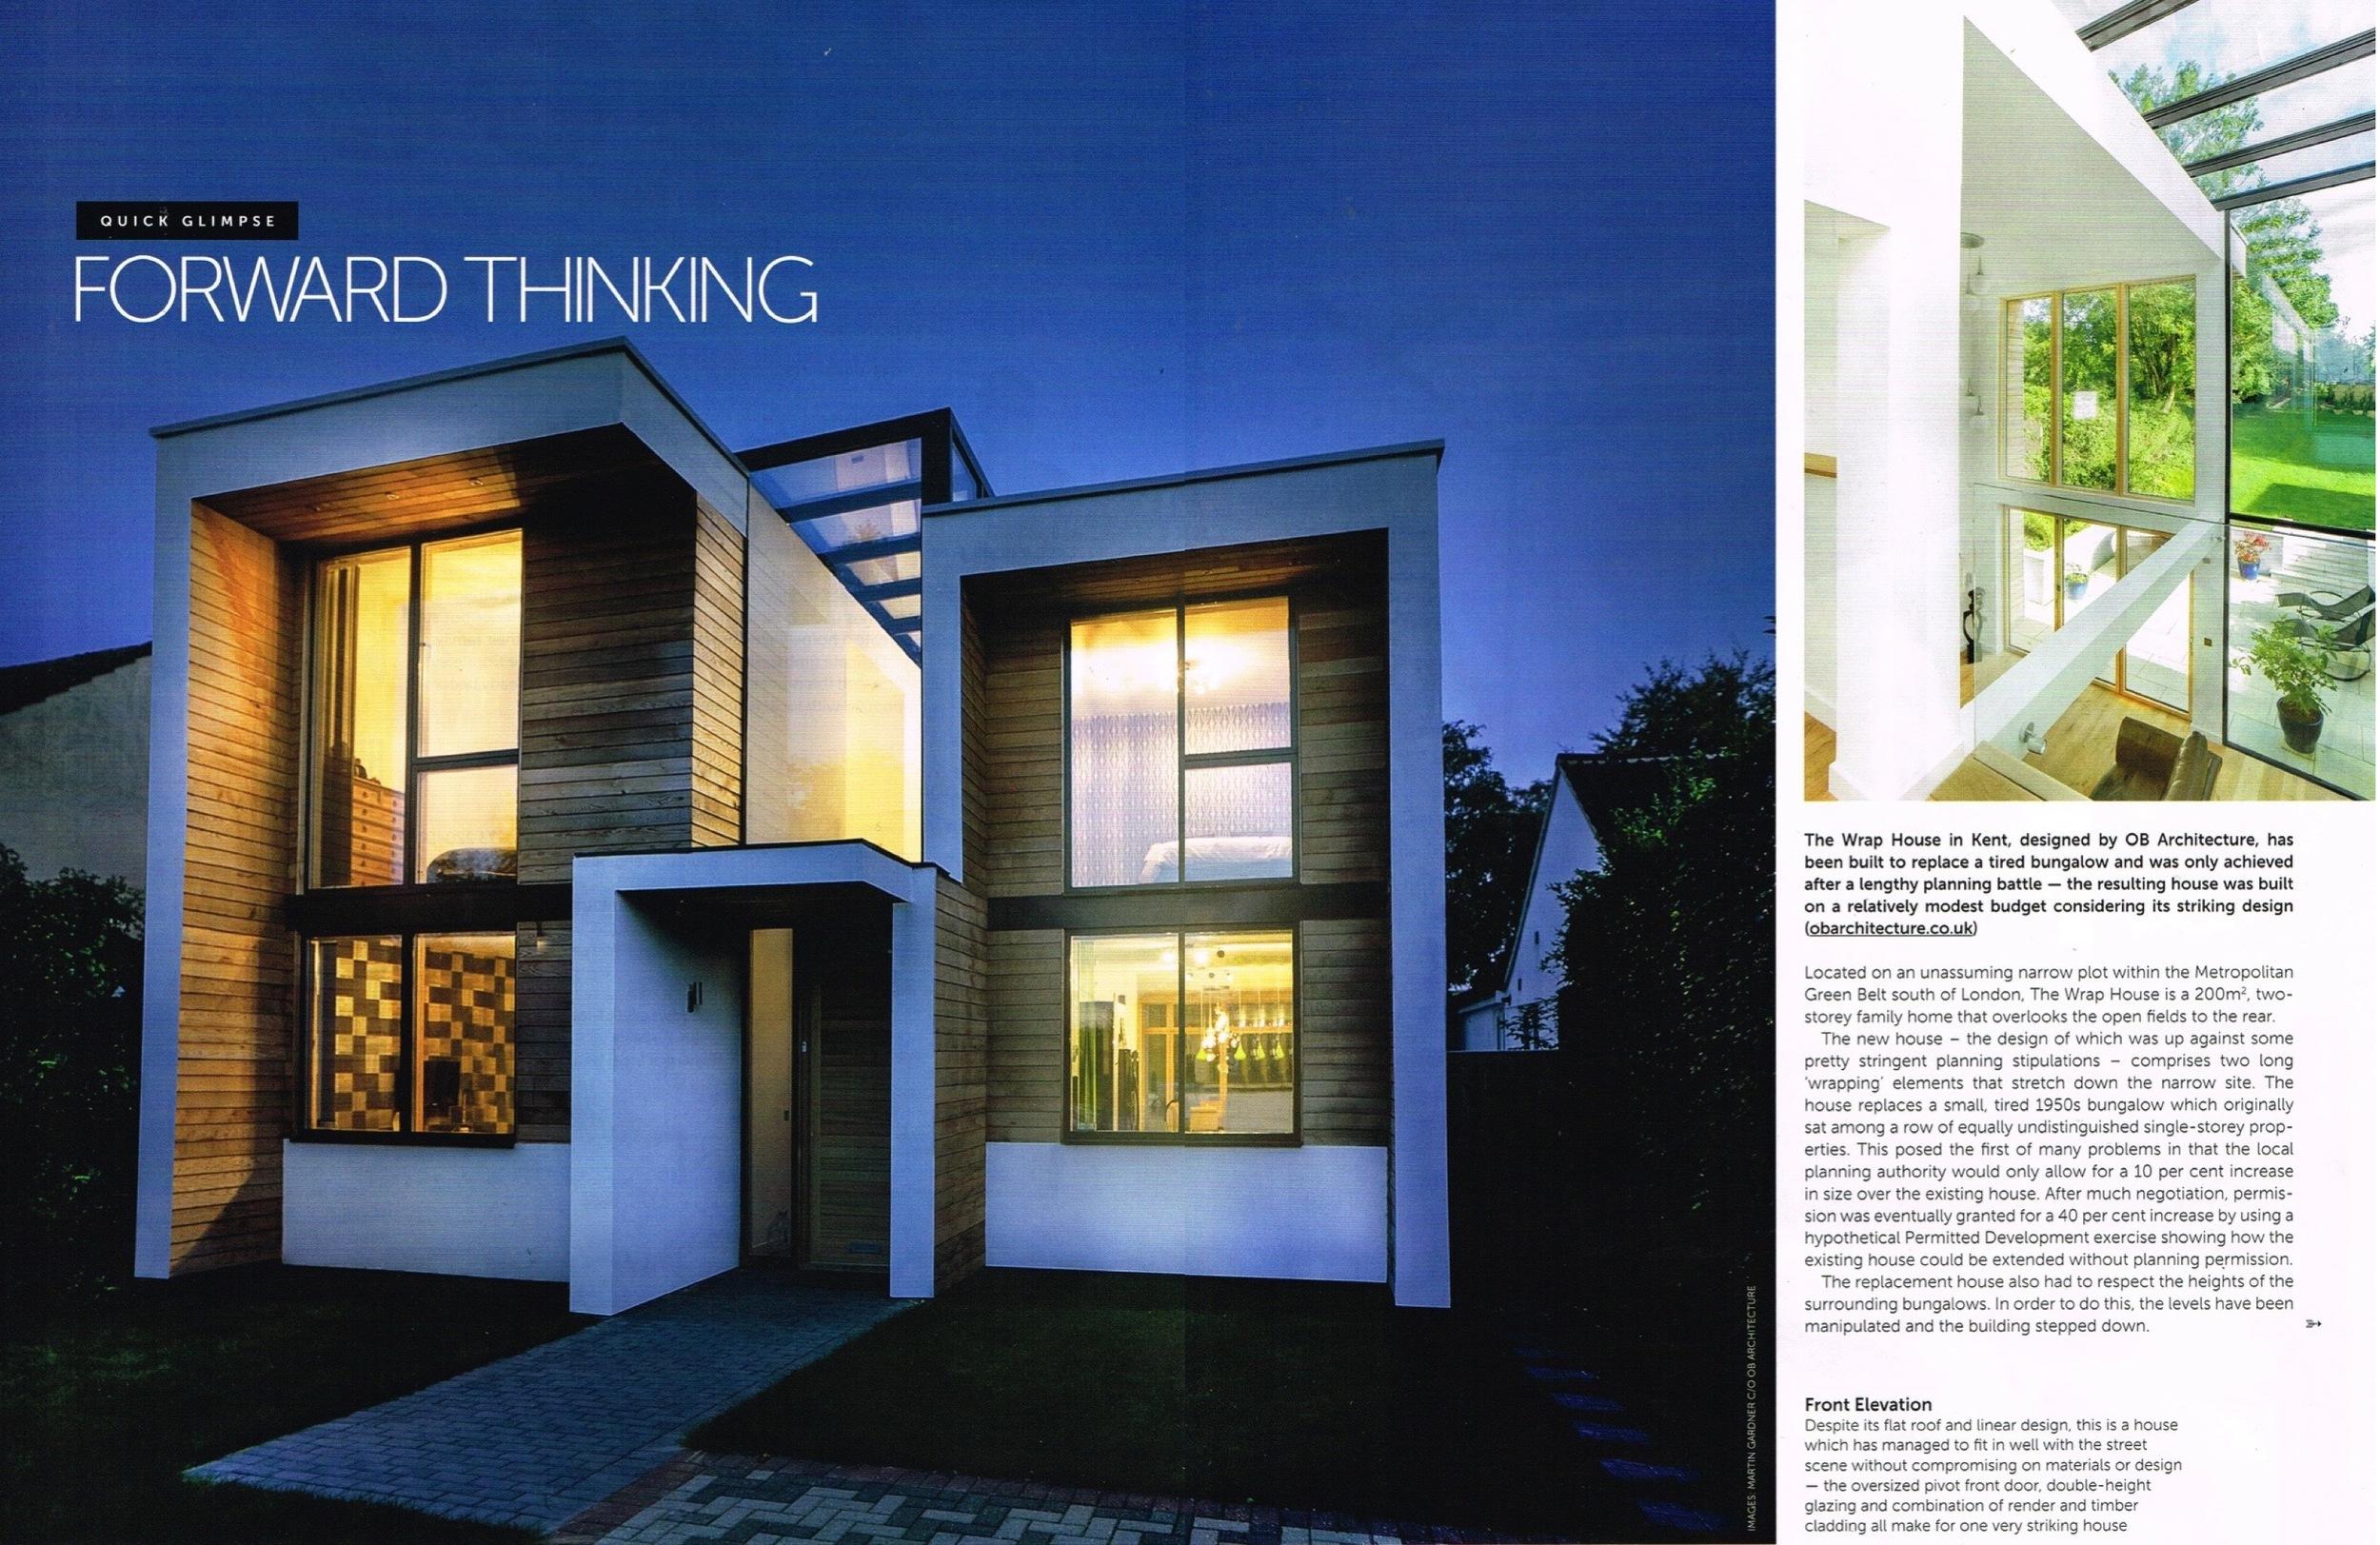 Homebuilding_&_Renovating_Wrap_House_OB_Architecture_Sept_2016